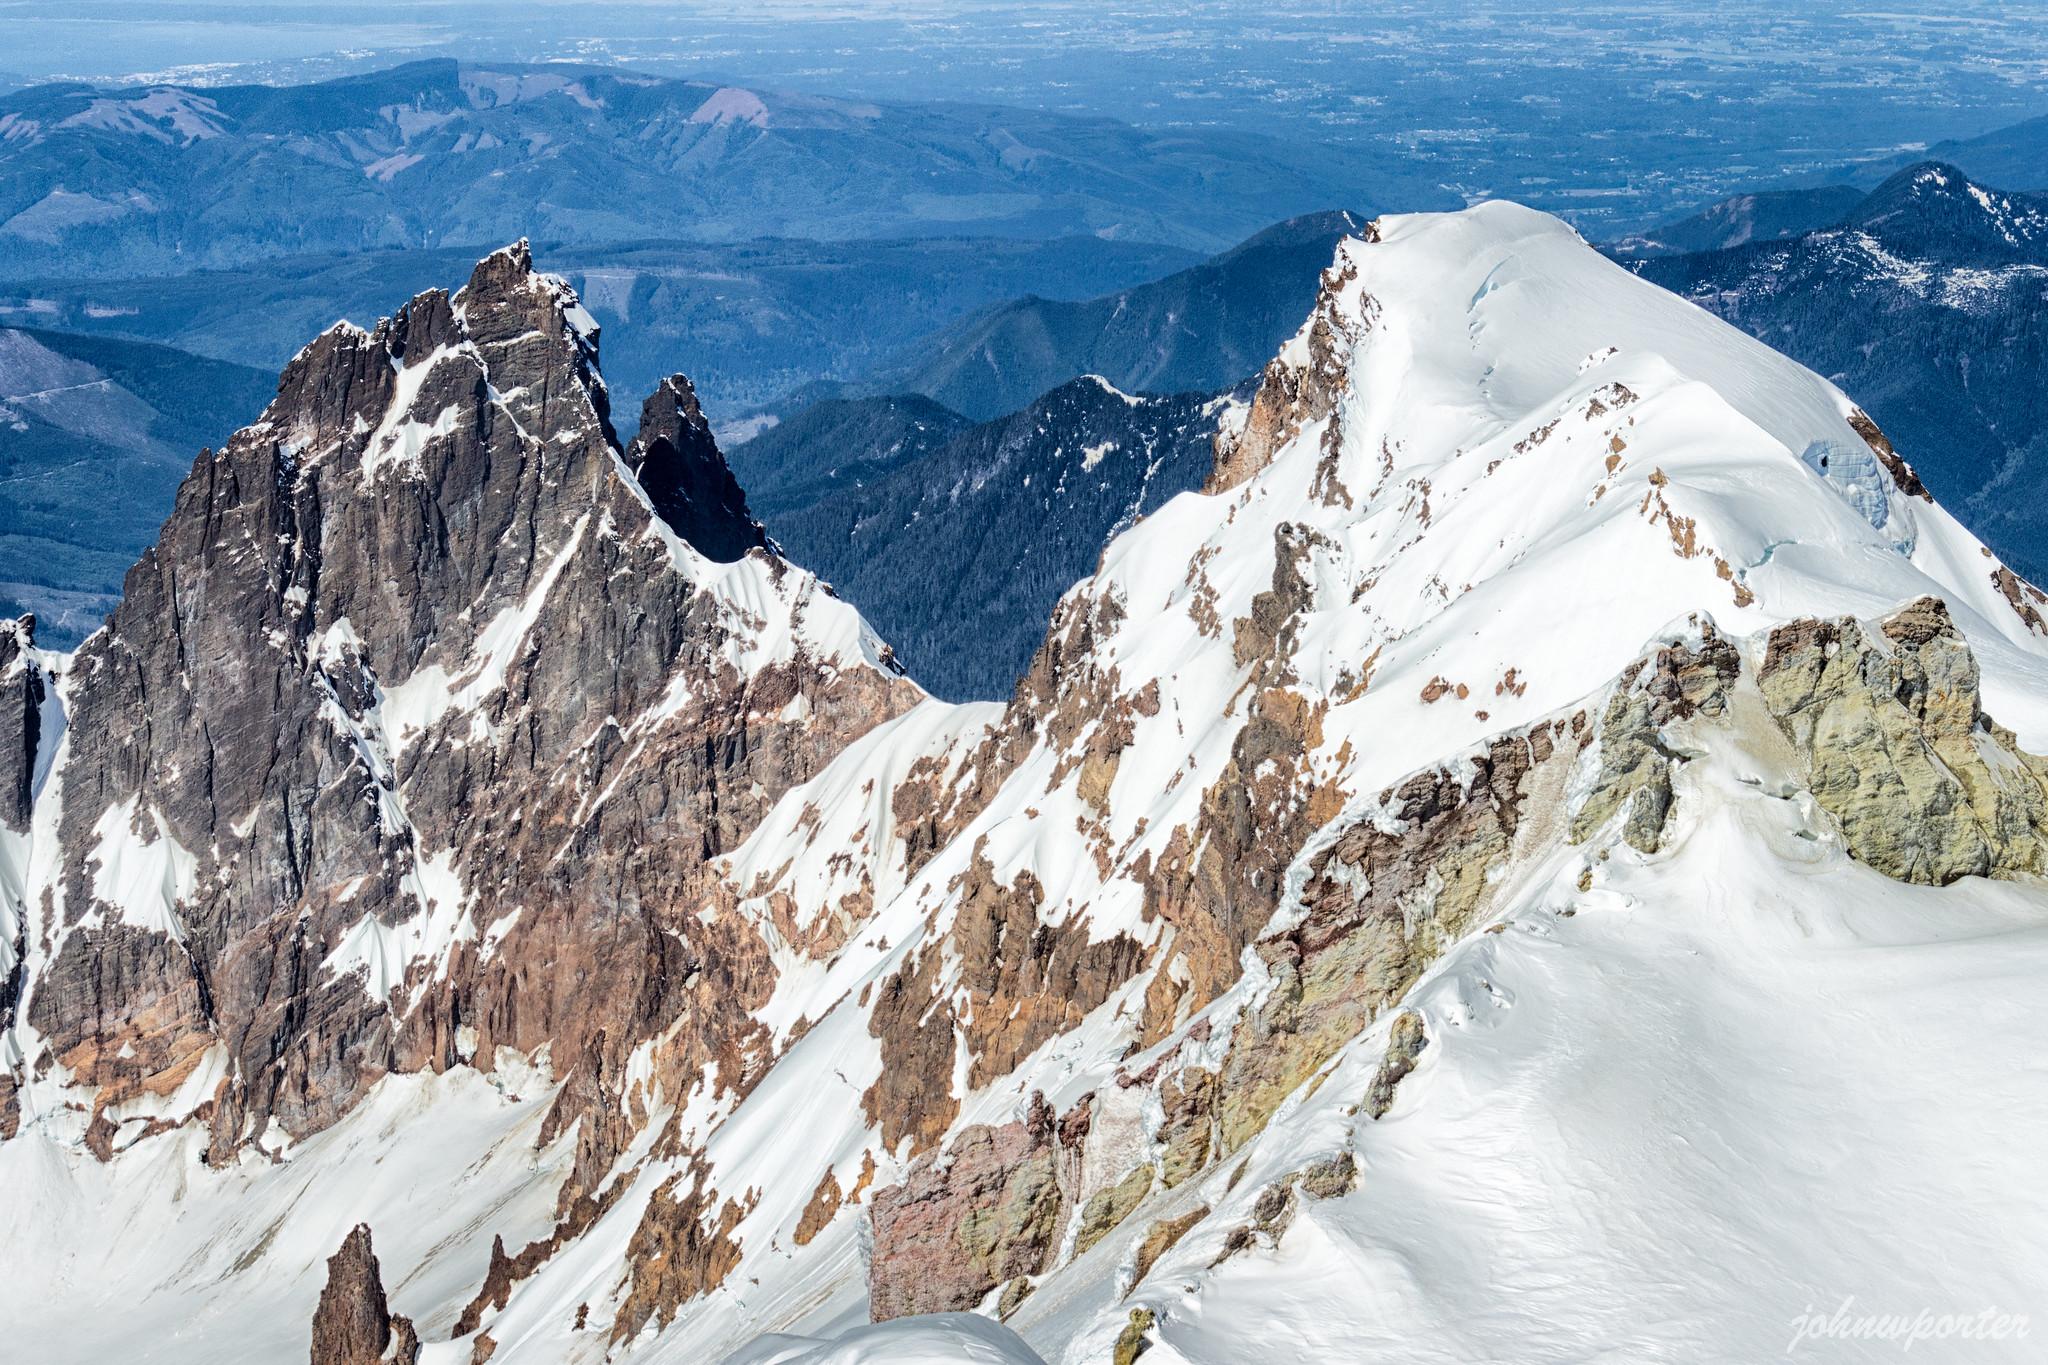 Lincoln Peak and Colfax Peak from Sherman Peak